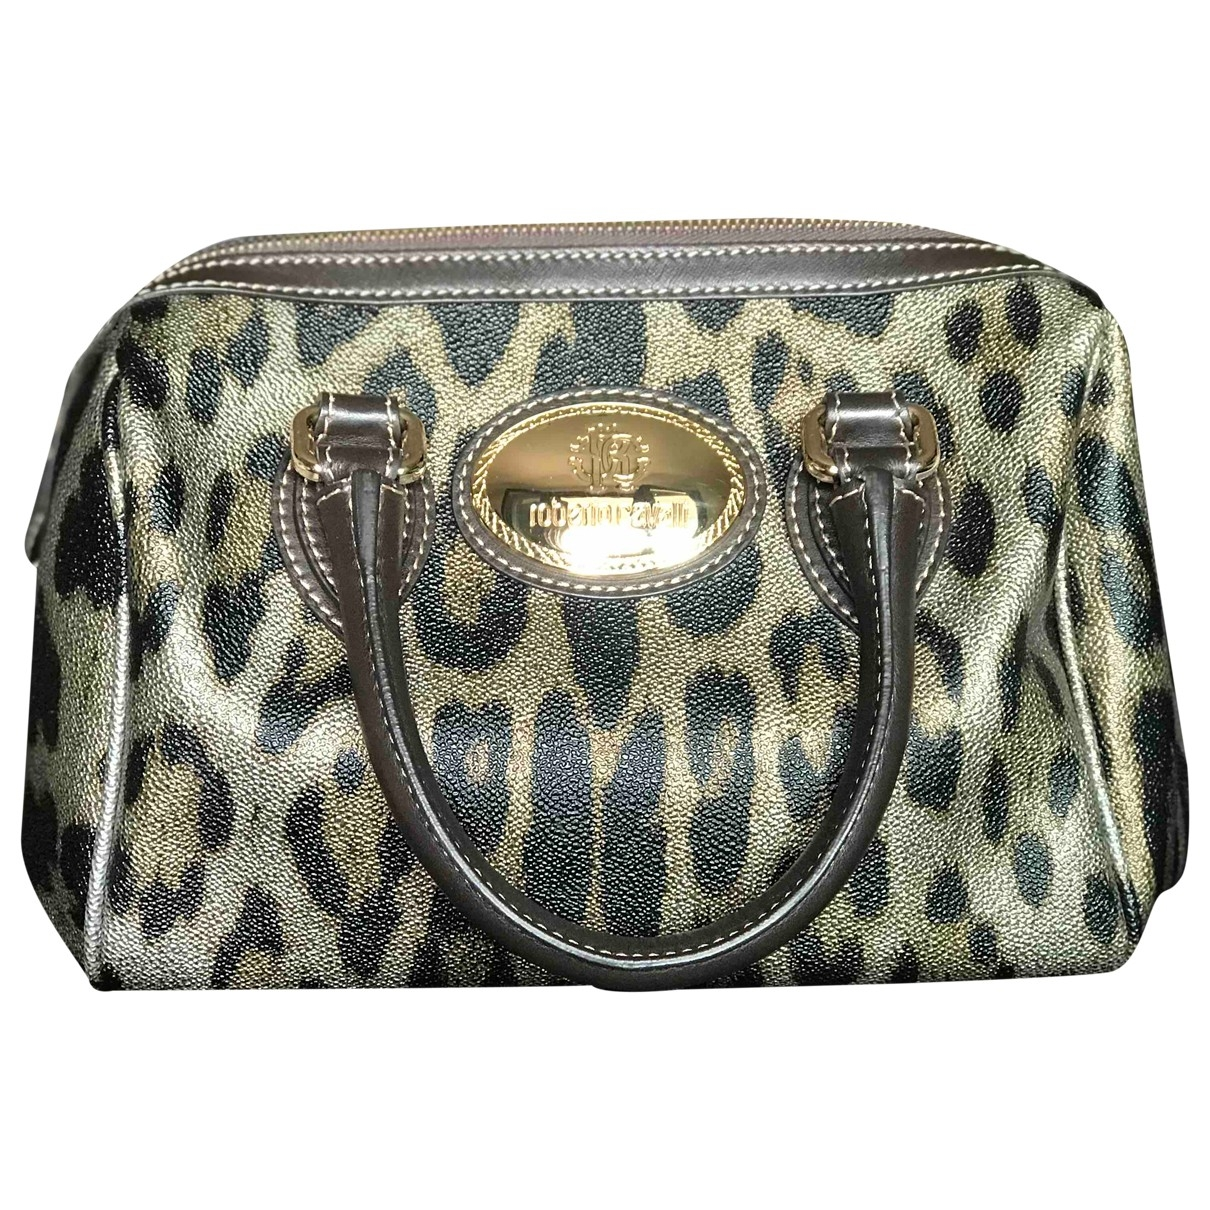 Roberto Cavalli \N Leather handbag for Women \N